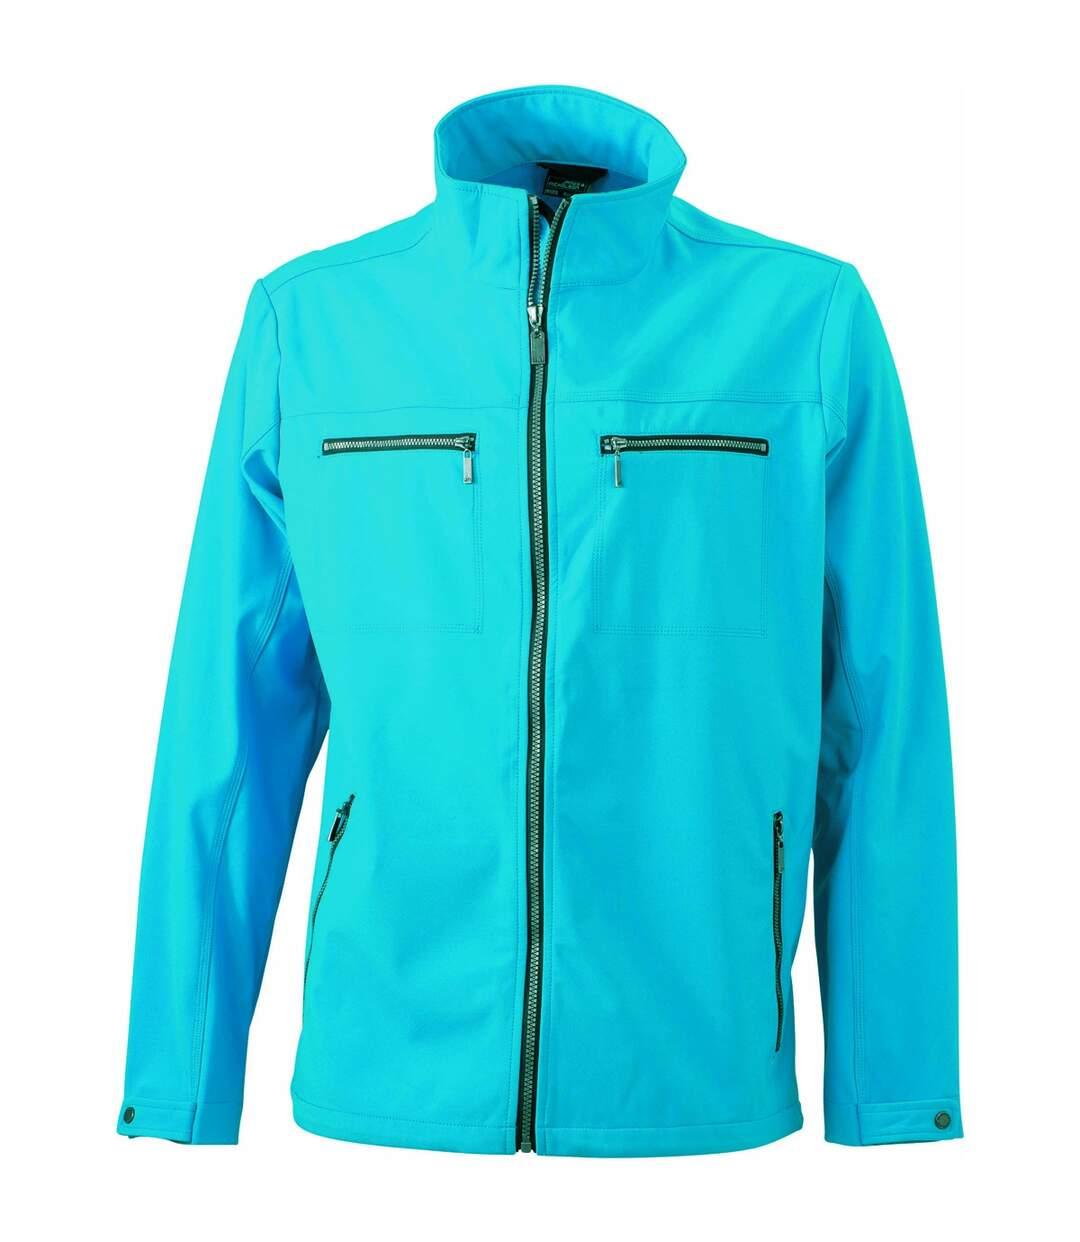 Veste moulante softshell HOMME JN1058 - bleu turquoise